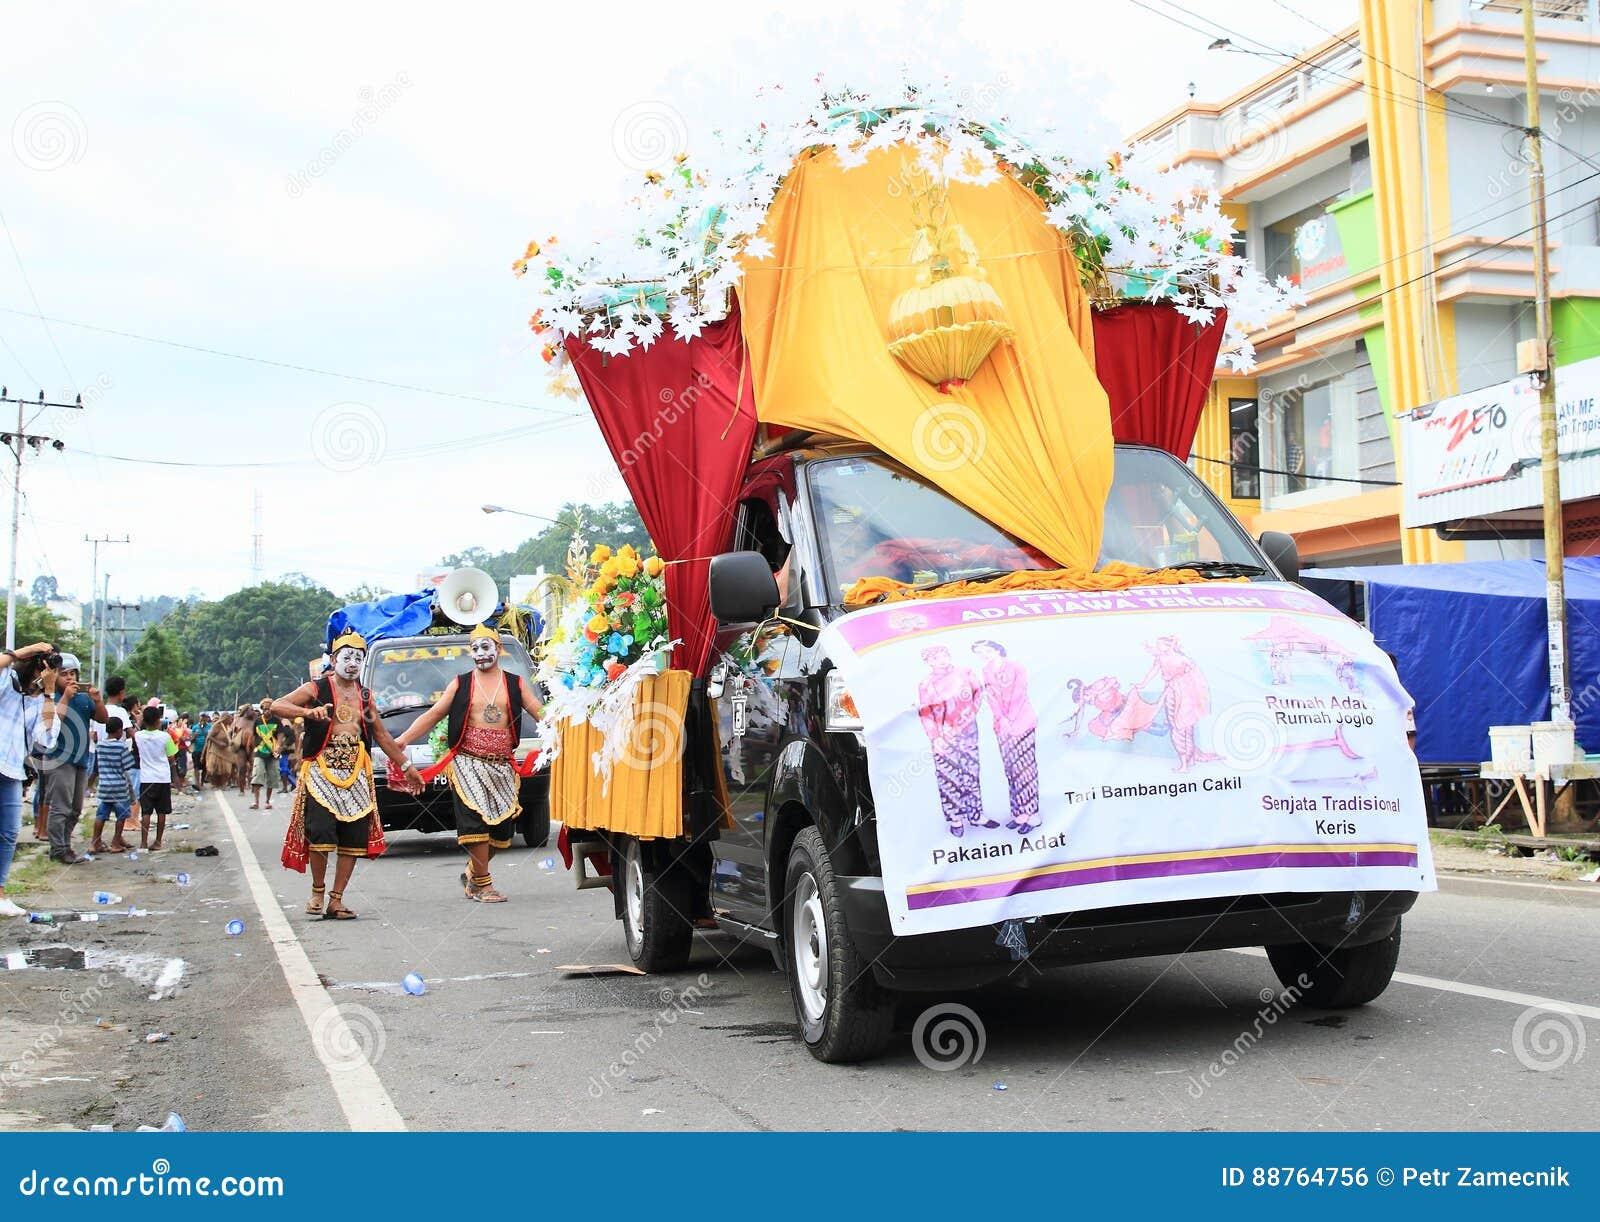 Parade Float From Jawa Tengah Editorial Photo Image Of Decoration